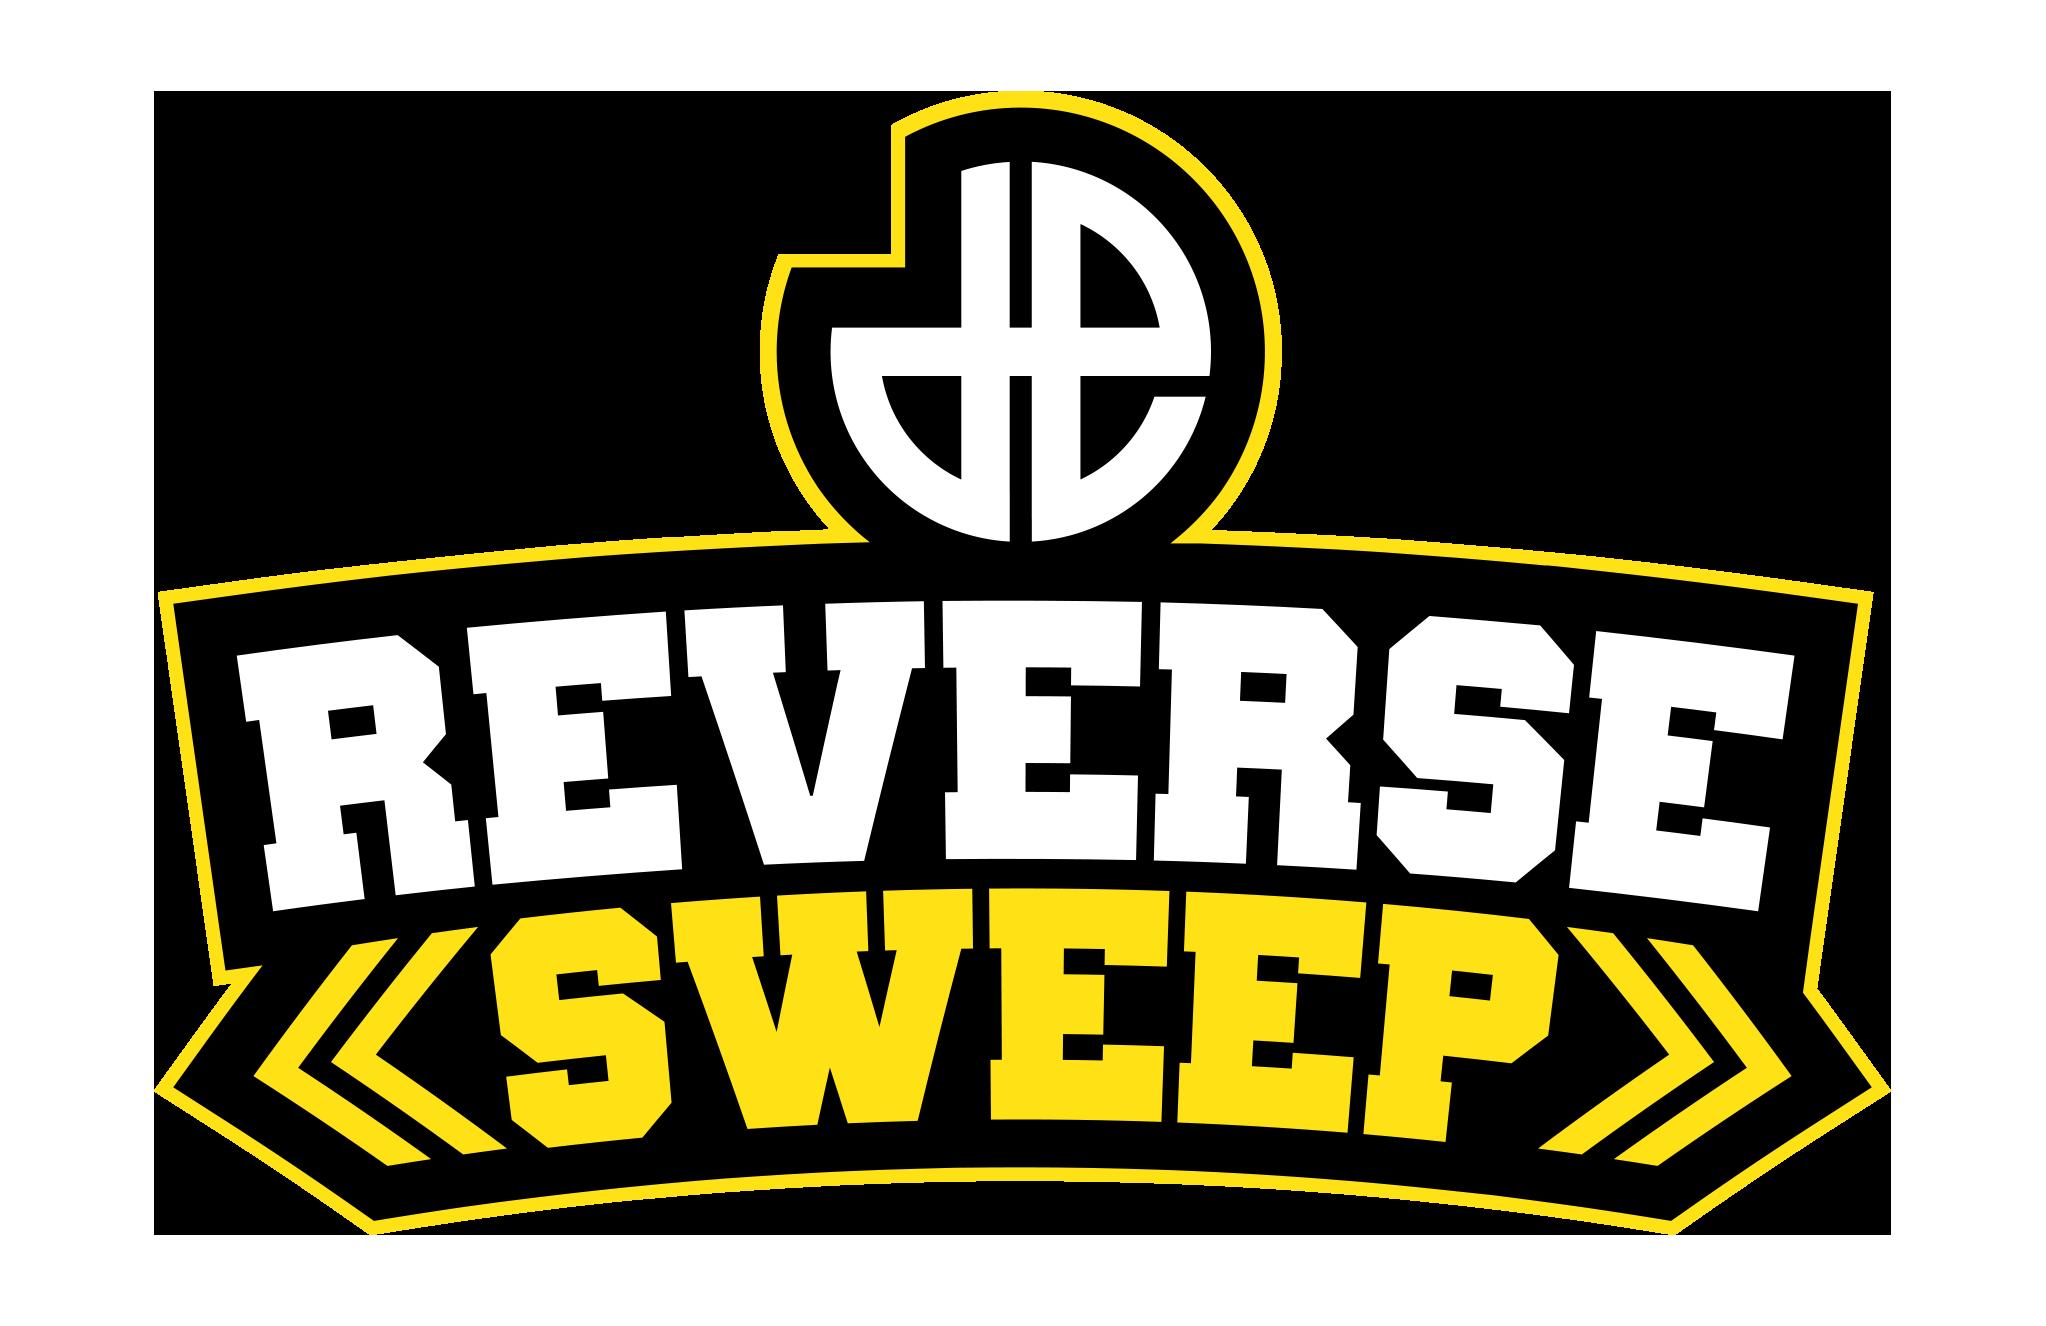 Reverse sweep logo